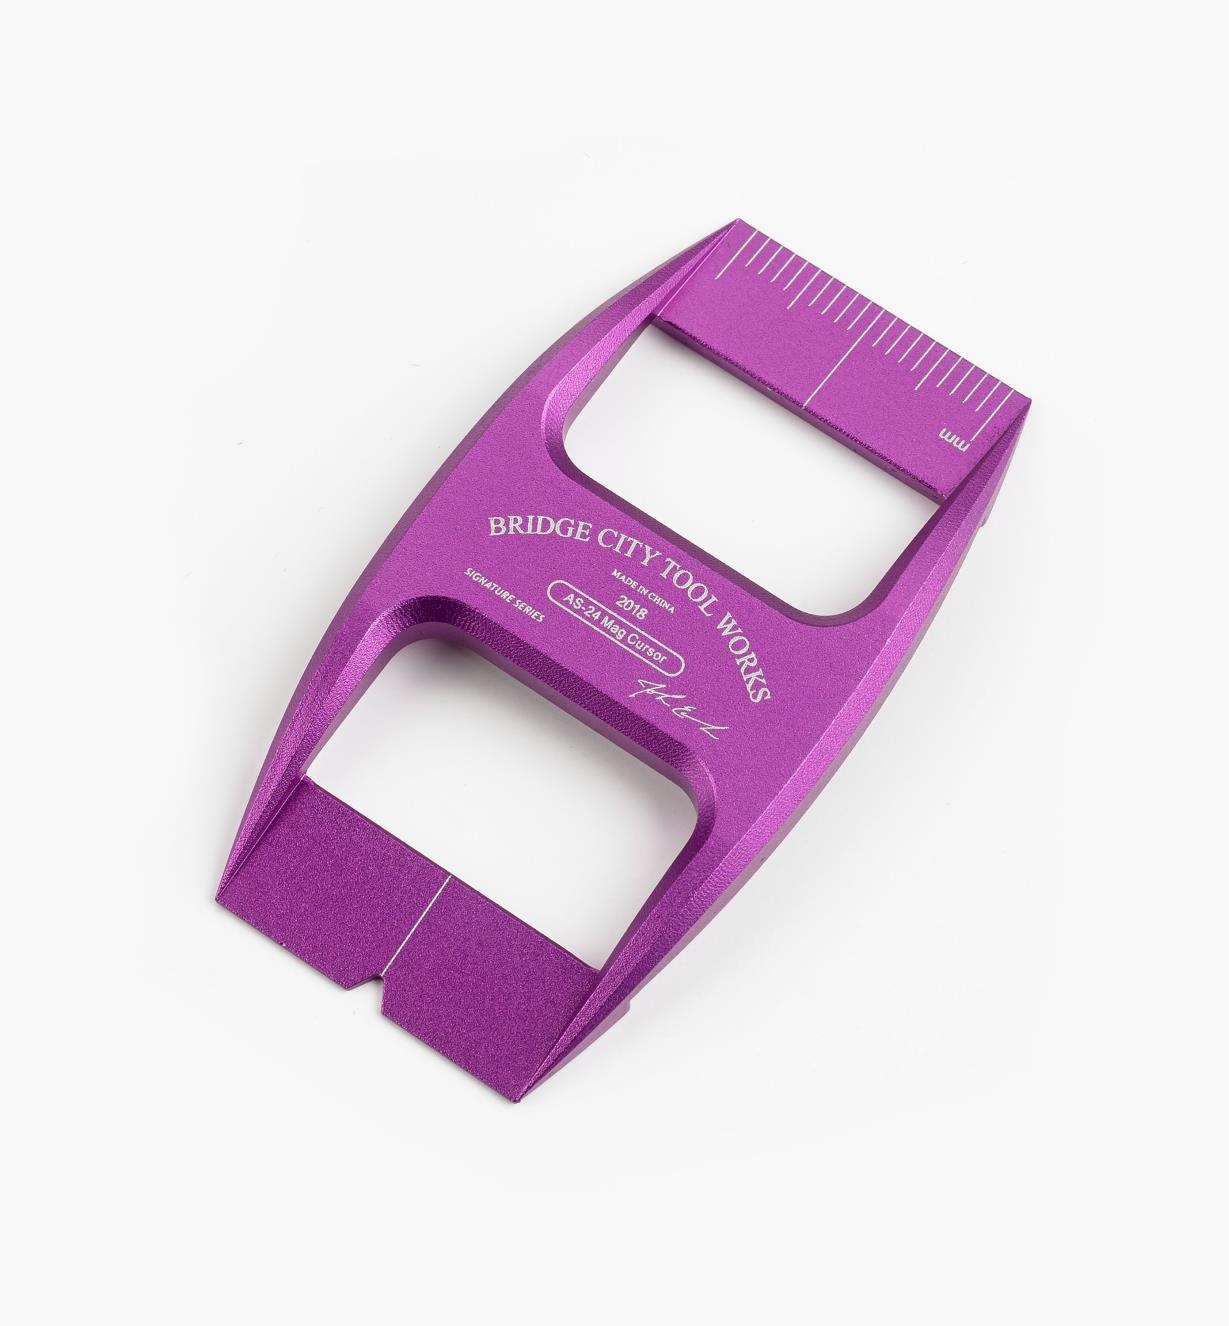 17N1686 - Bridge City Purple Metric Cursor